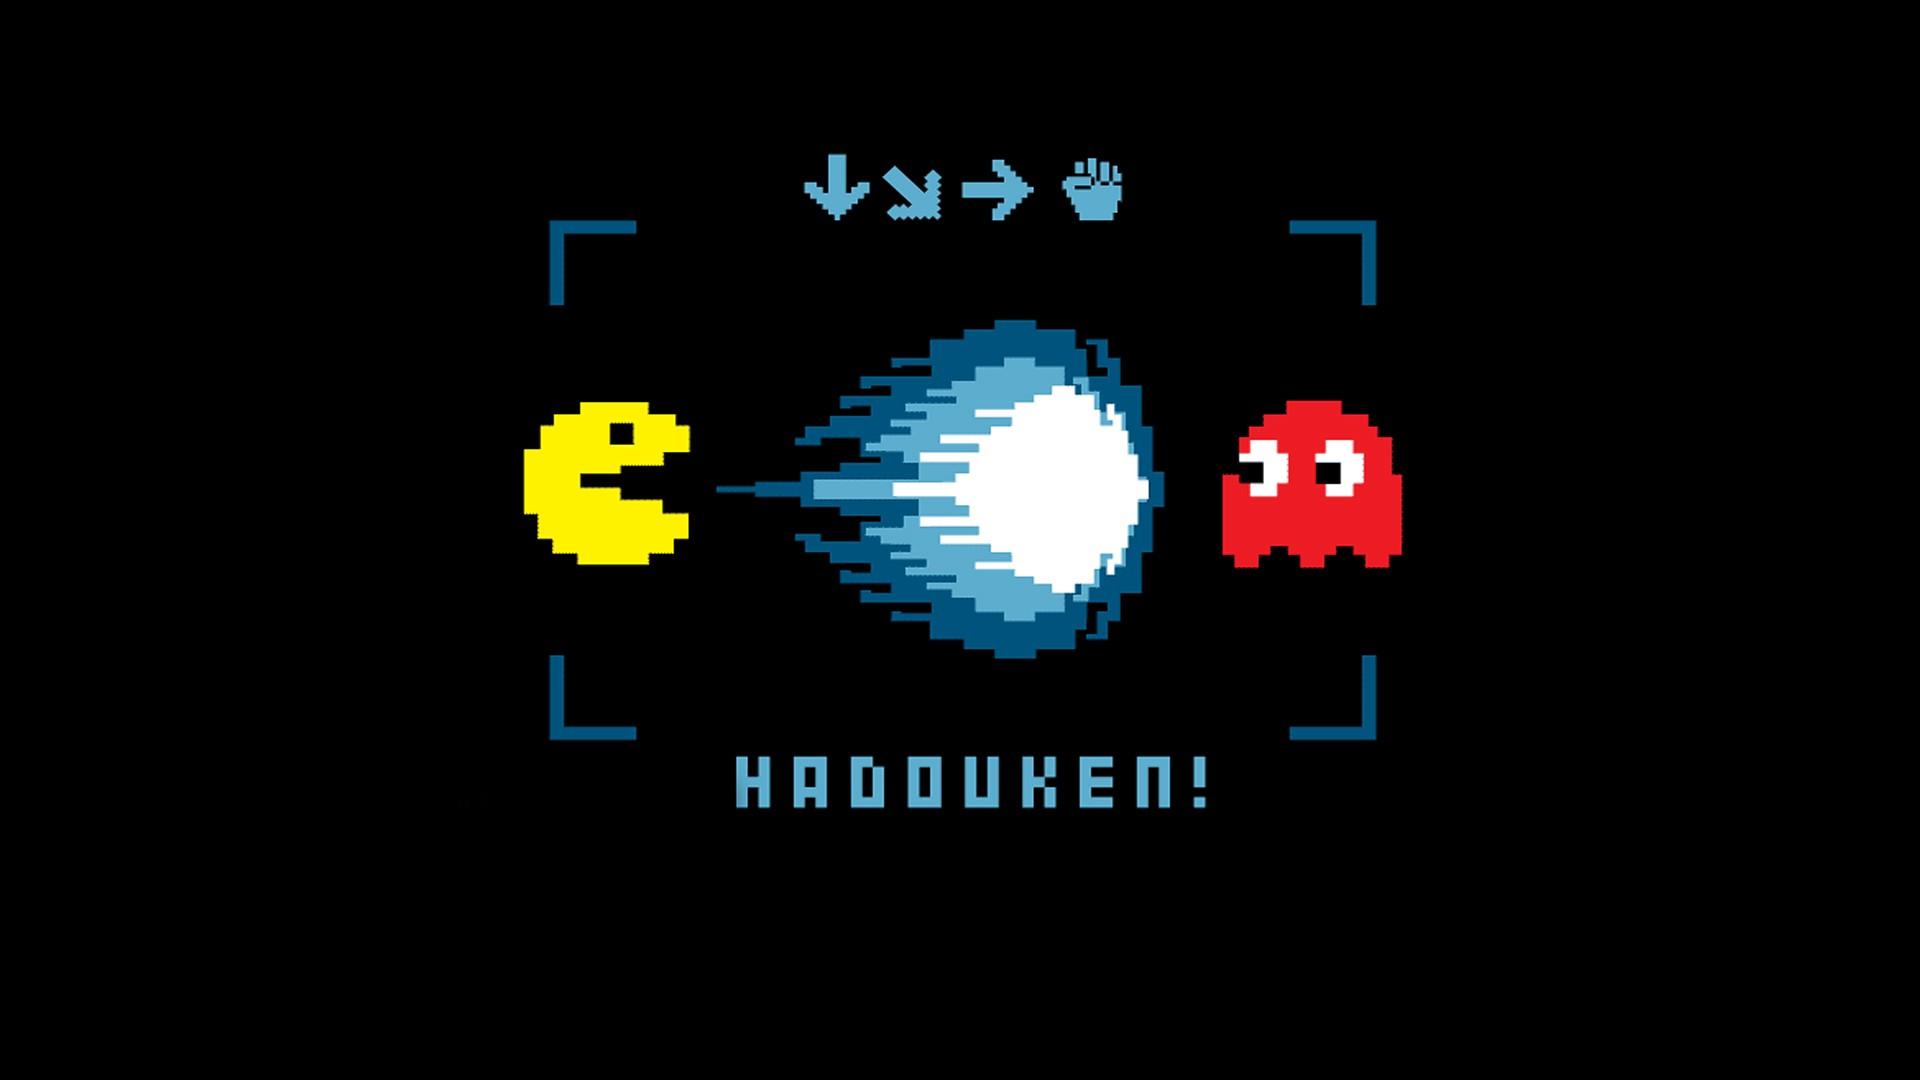 Pac Man Computer Wallpapers Desktop Backgrounds HD Wallpapers Download Free Images Wallpaper [1000image.com]